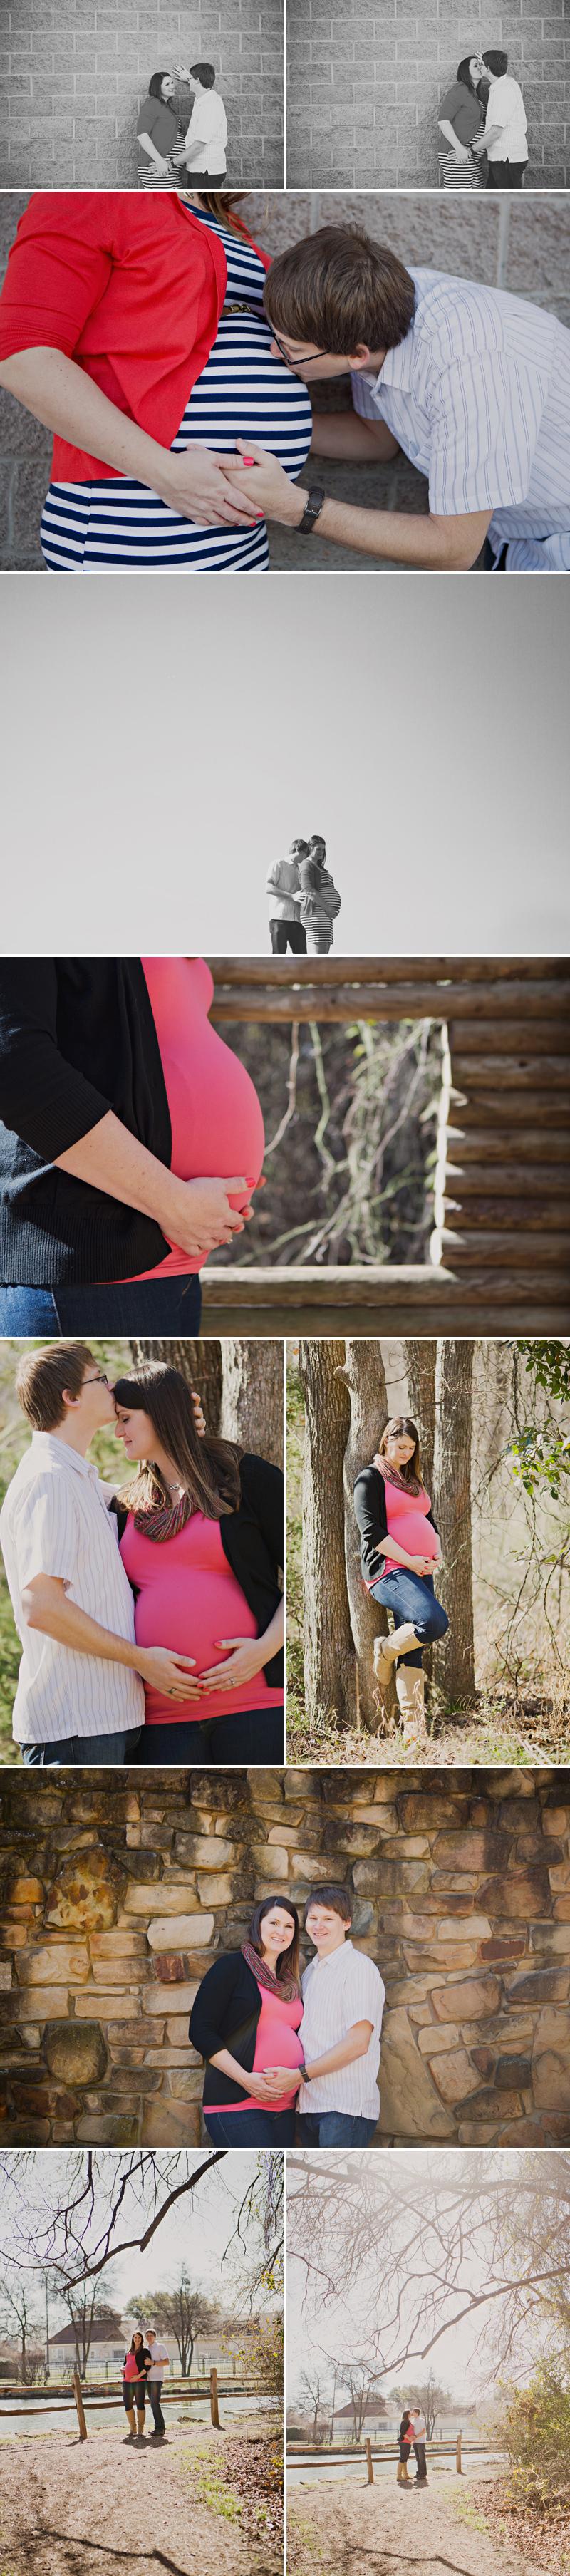 Dallas-Maternity-Photographercomp002